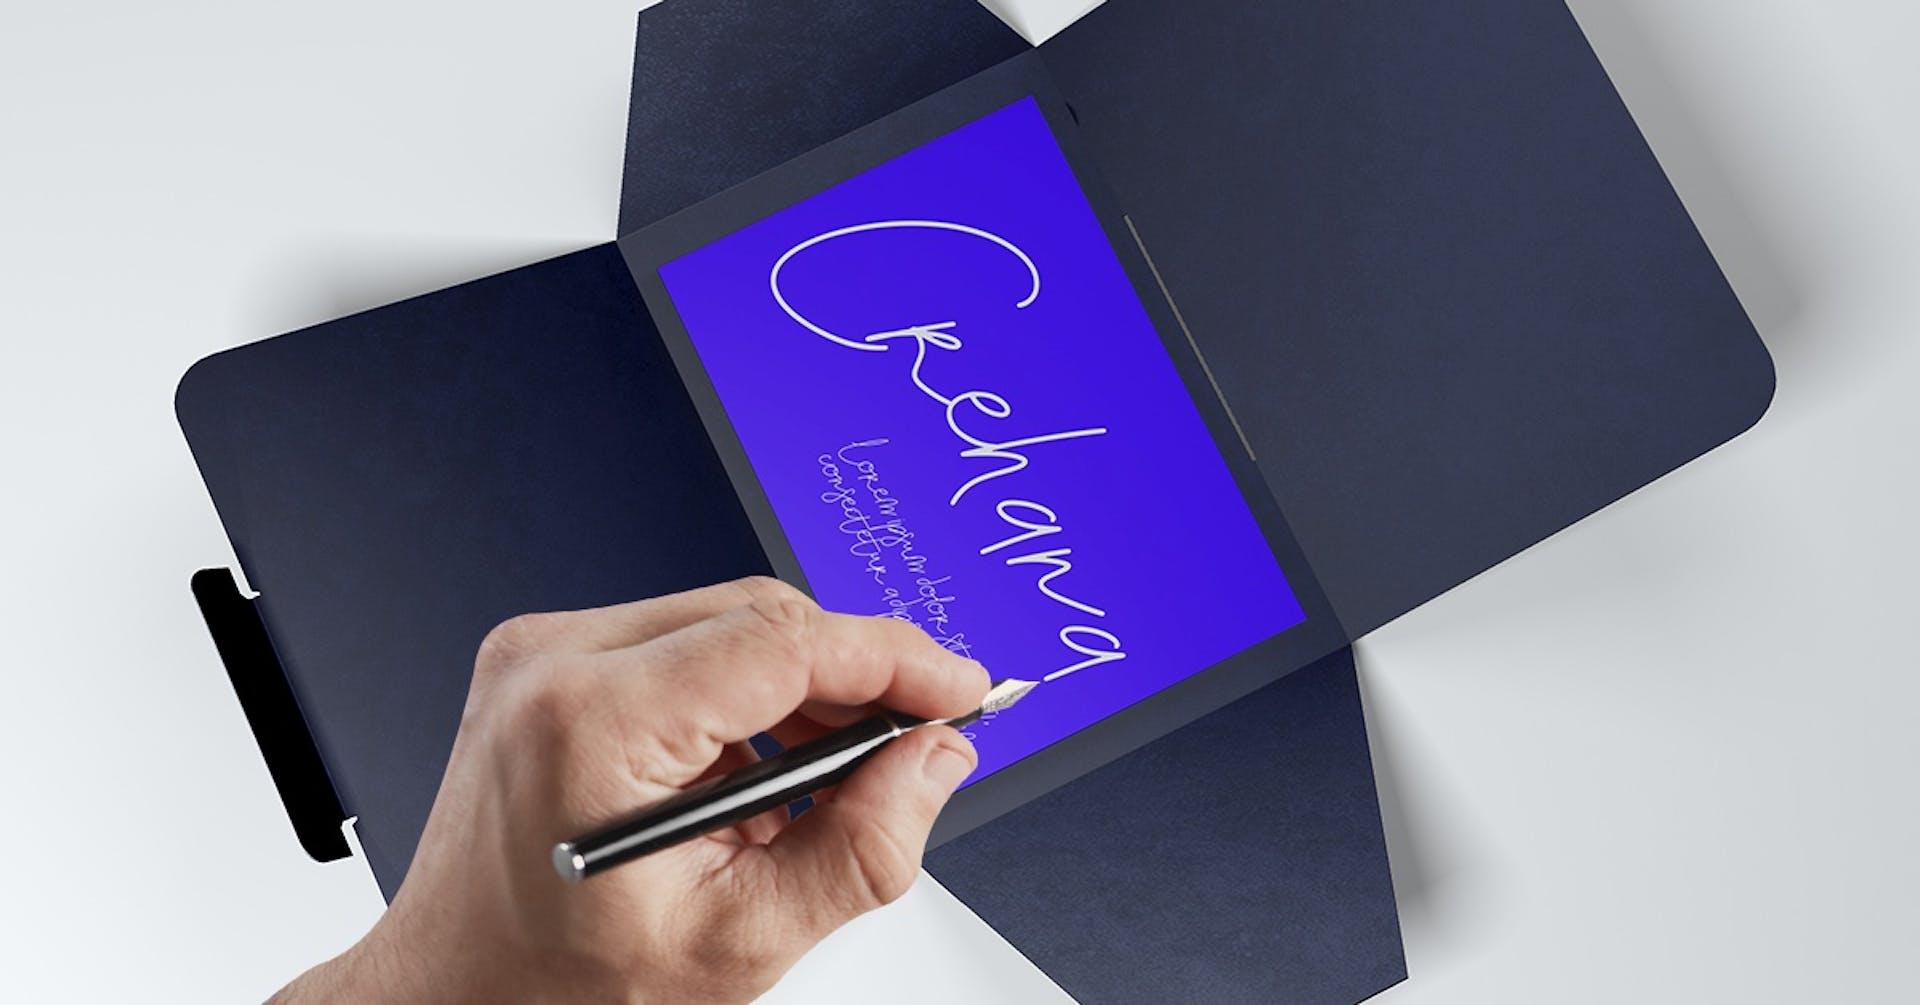 ¡Que nunca te falte estilo con estas tipografías para firmas gratis!